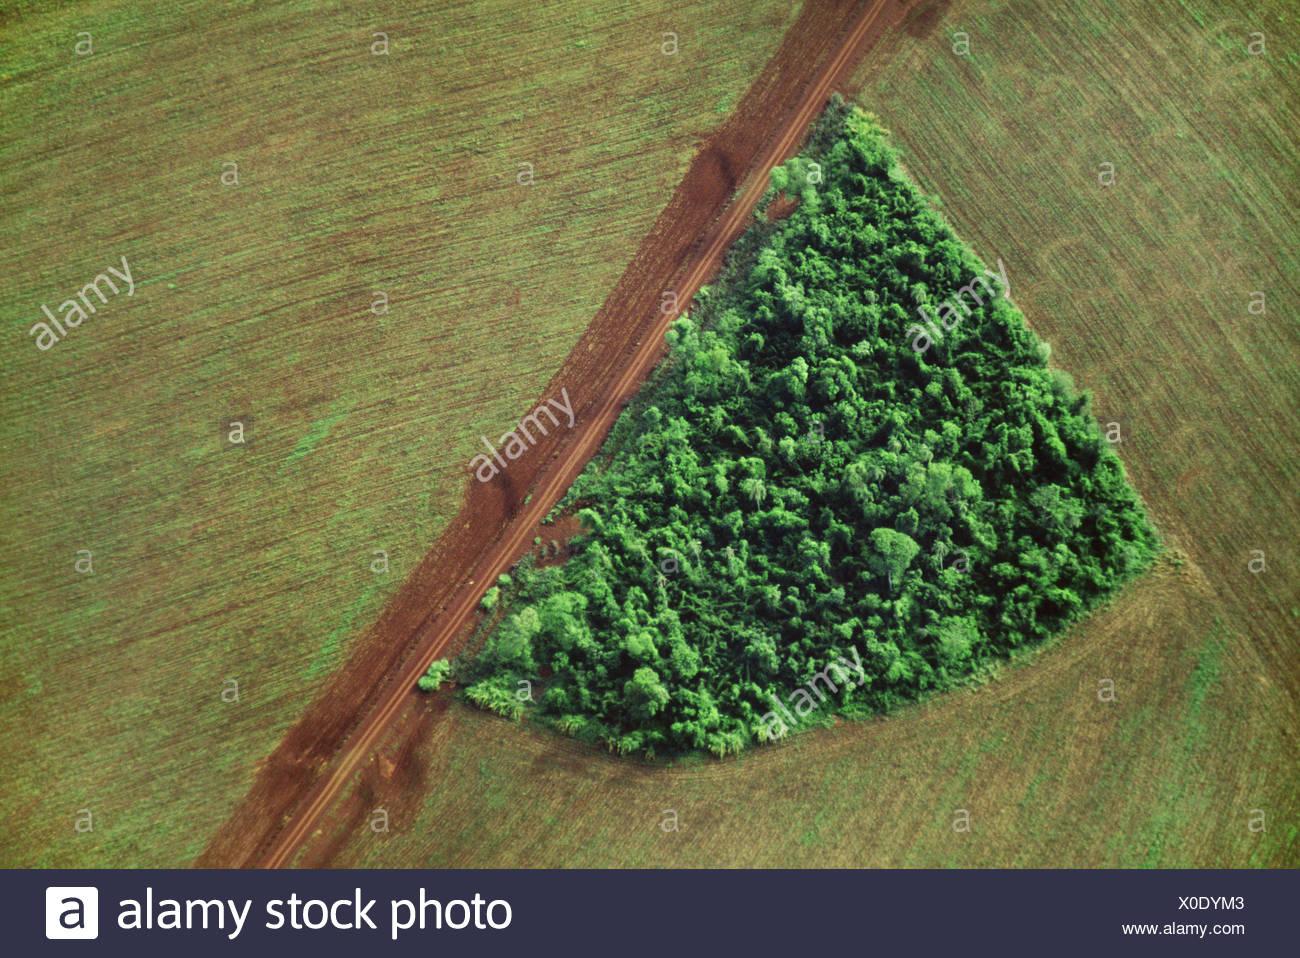 Iguacu National Park Brazil Rainforest remnant Iguacu National Park Brazil - Stock Image